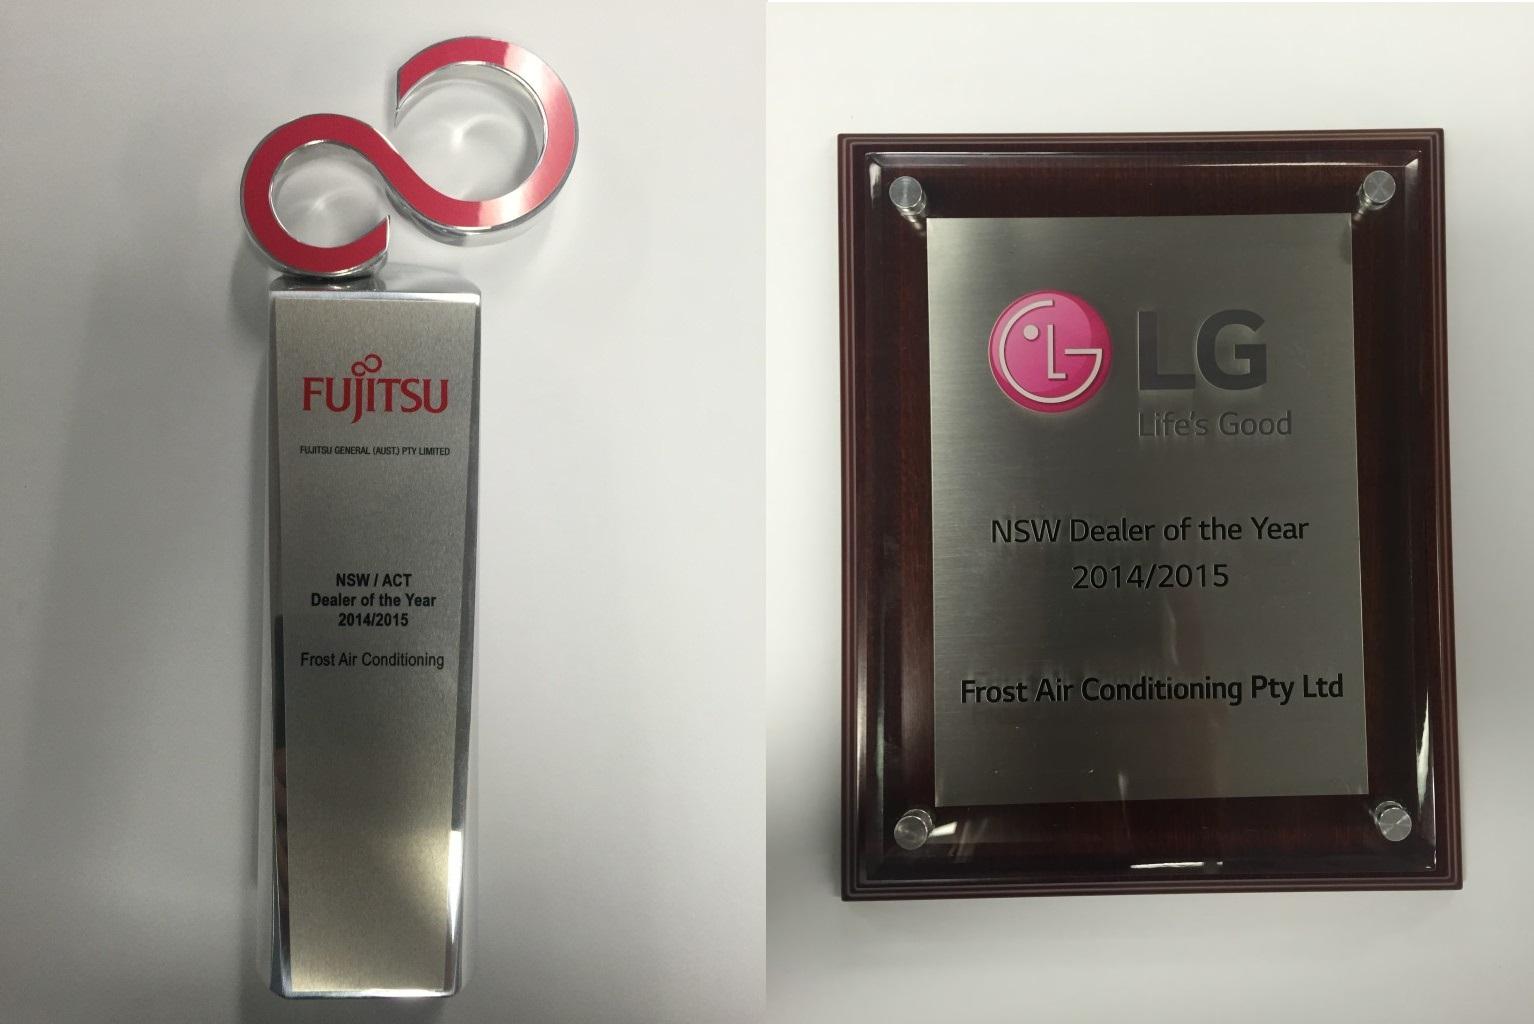 Fujitsu and LG NSW Dealer of year 2014/2015! #9C2F3F